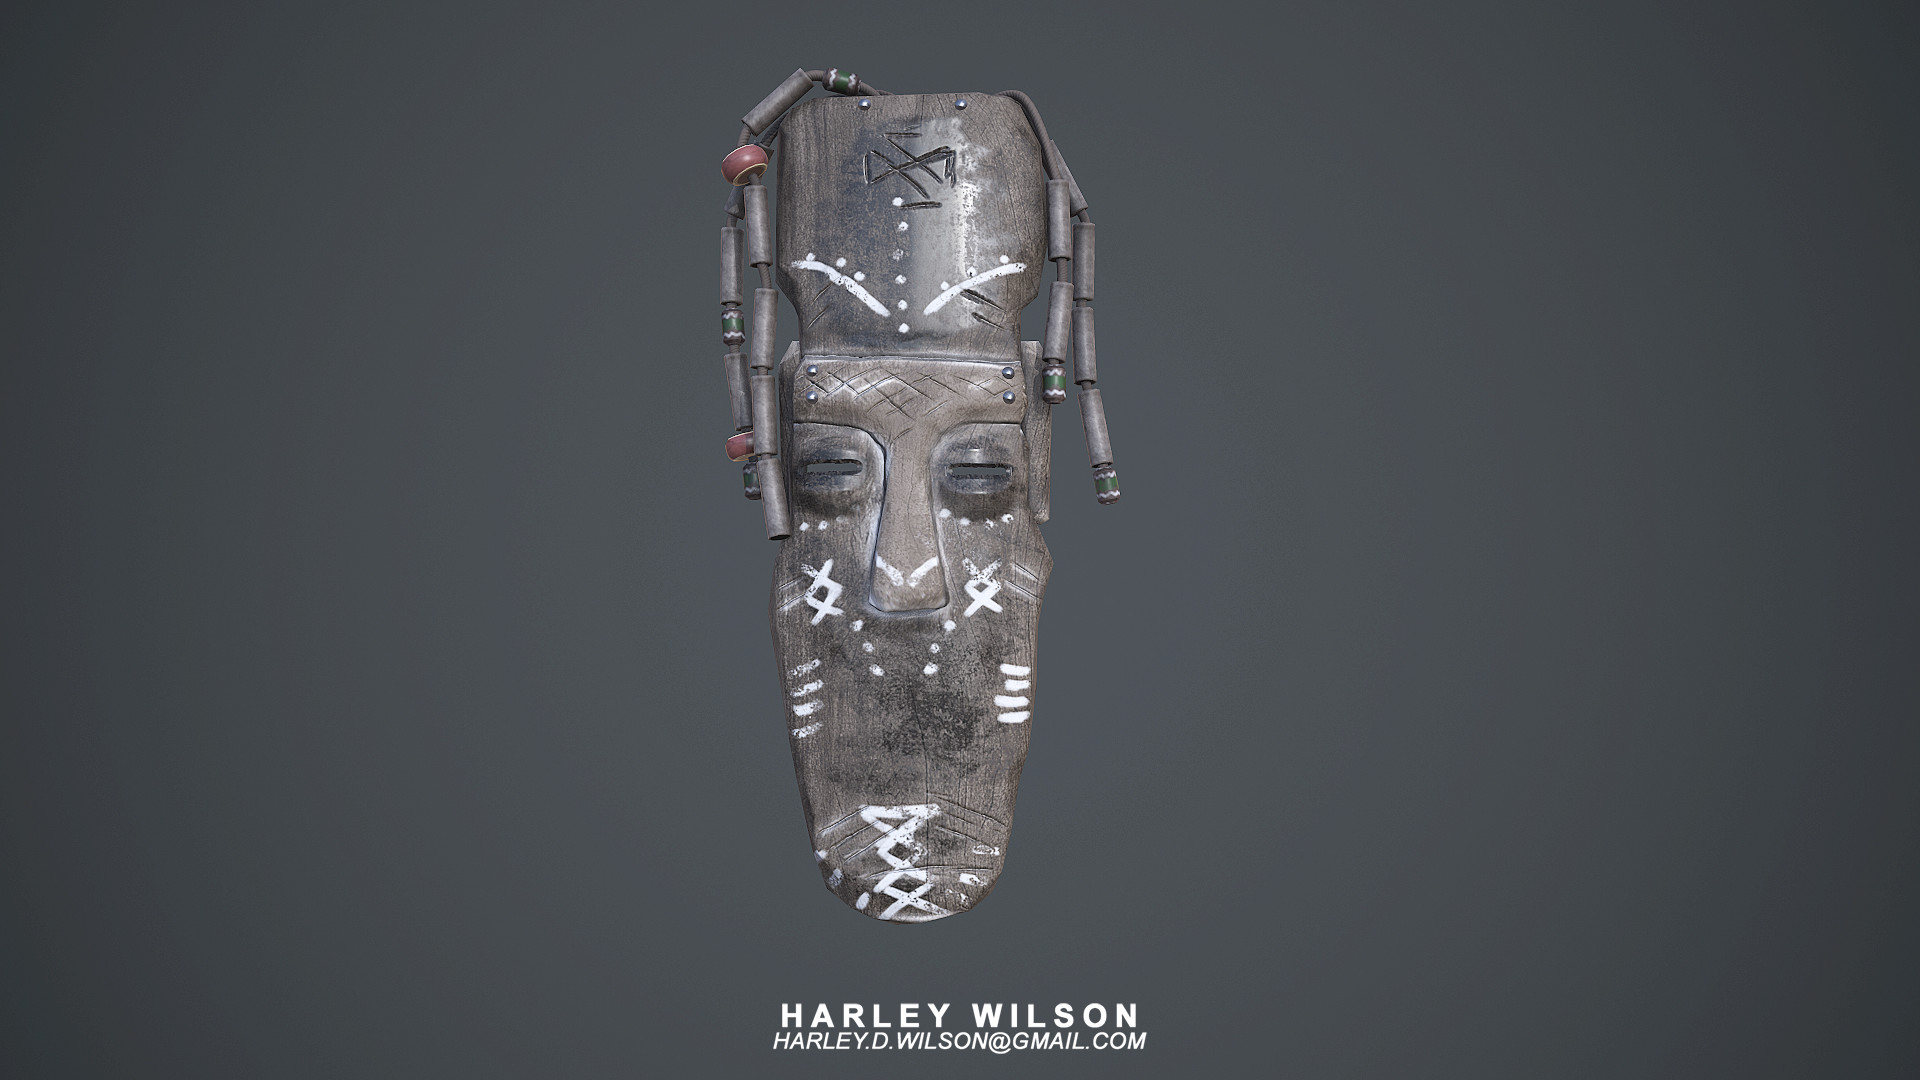 Harley wilson tribalmask png a